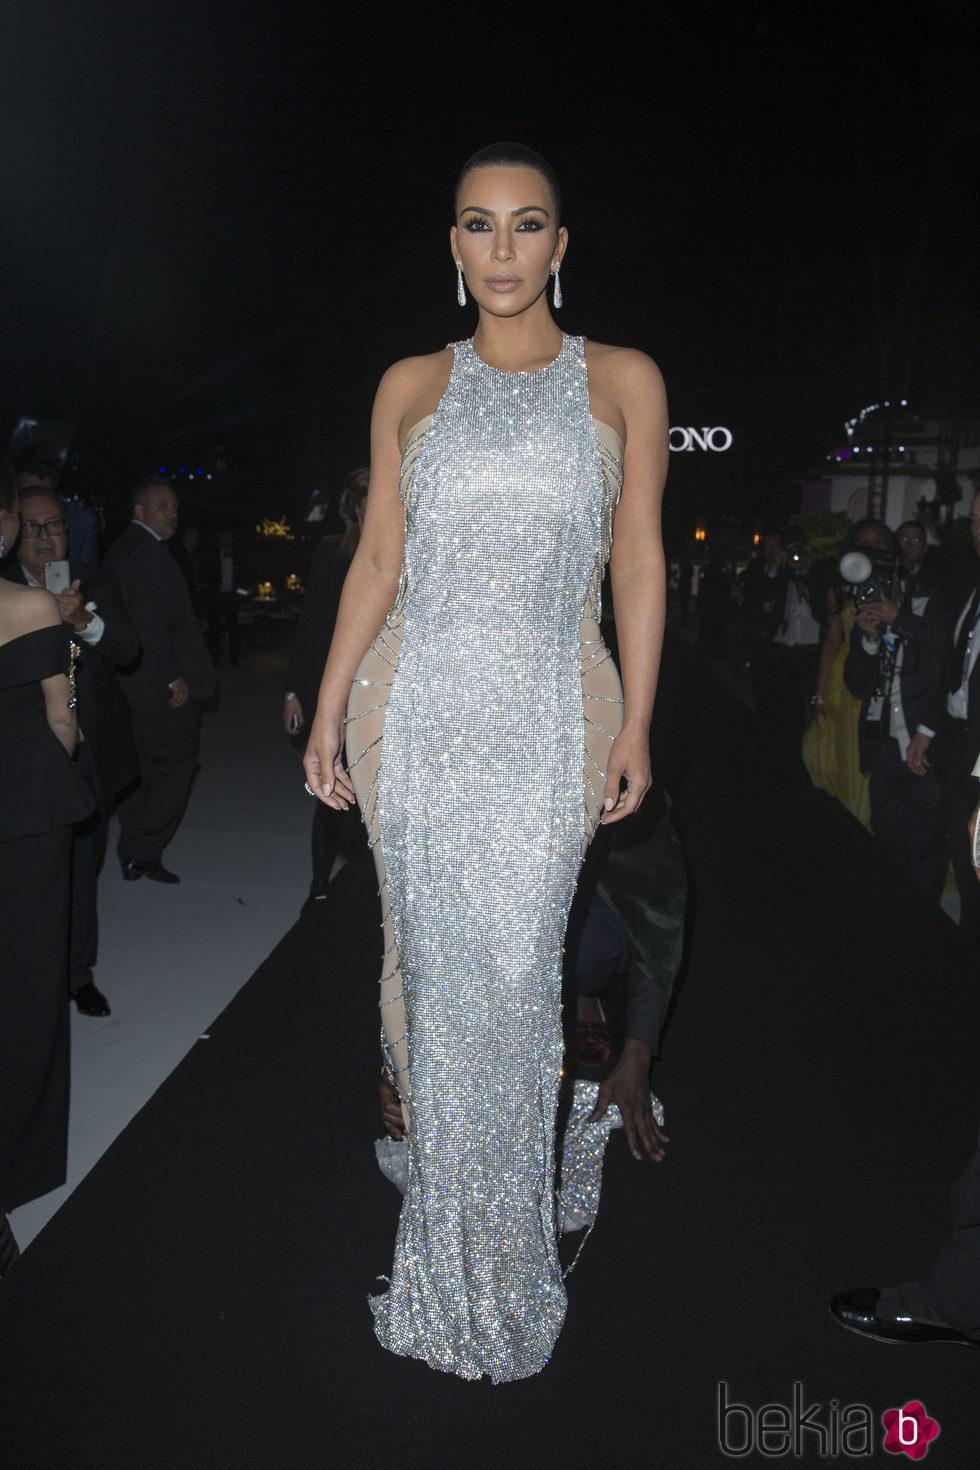 Kim Kardashian en la fiesta de Grisogono en el Festival de Cannes 2016